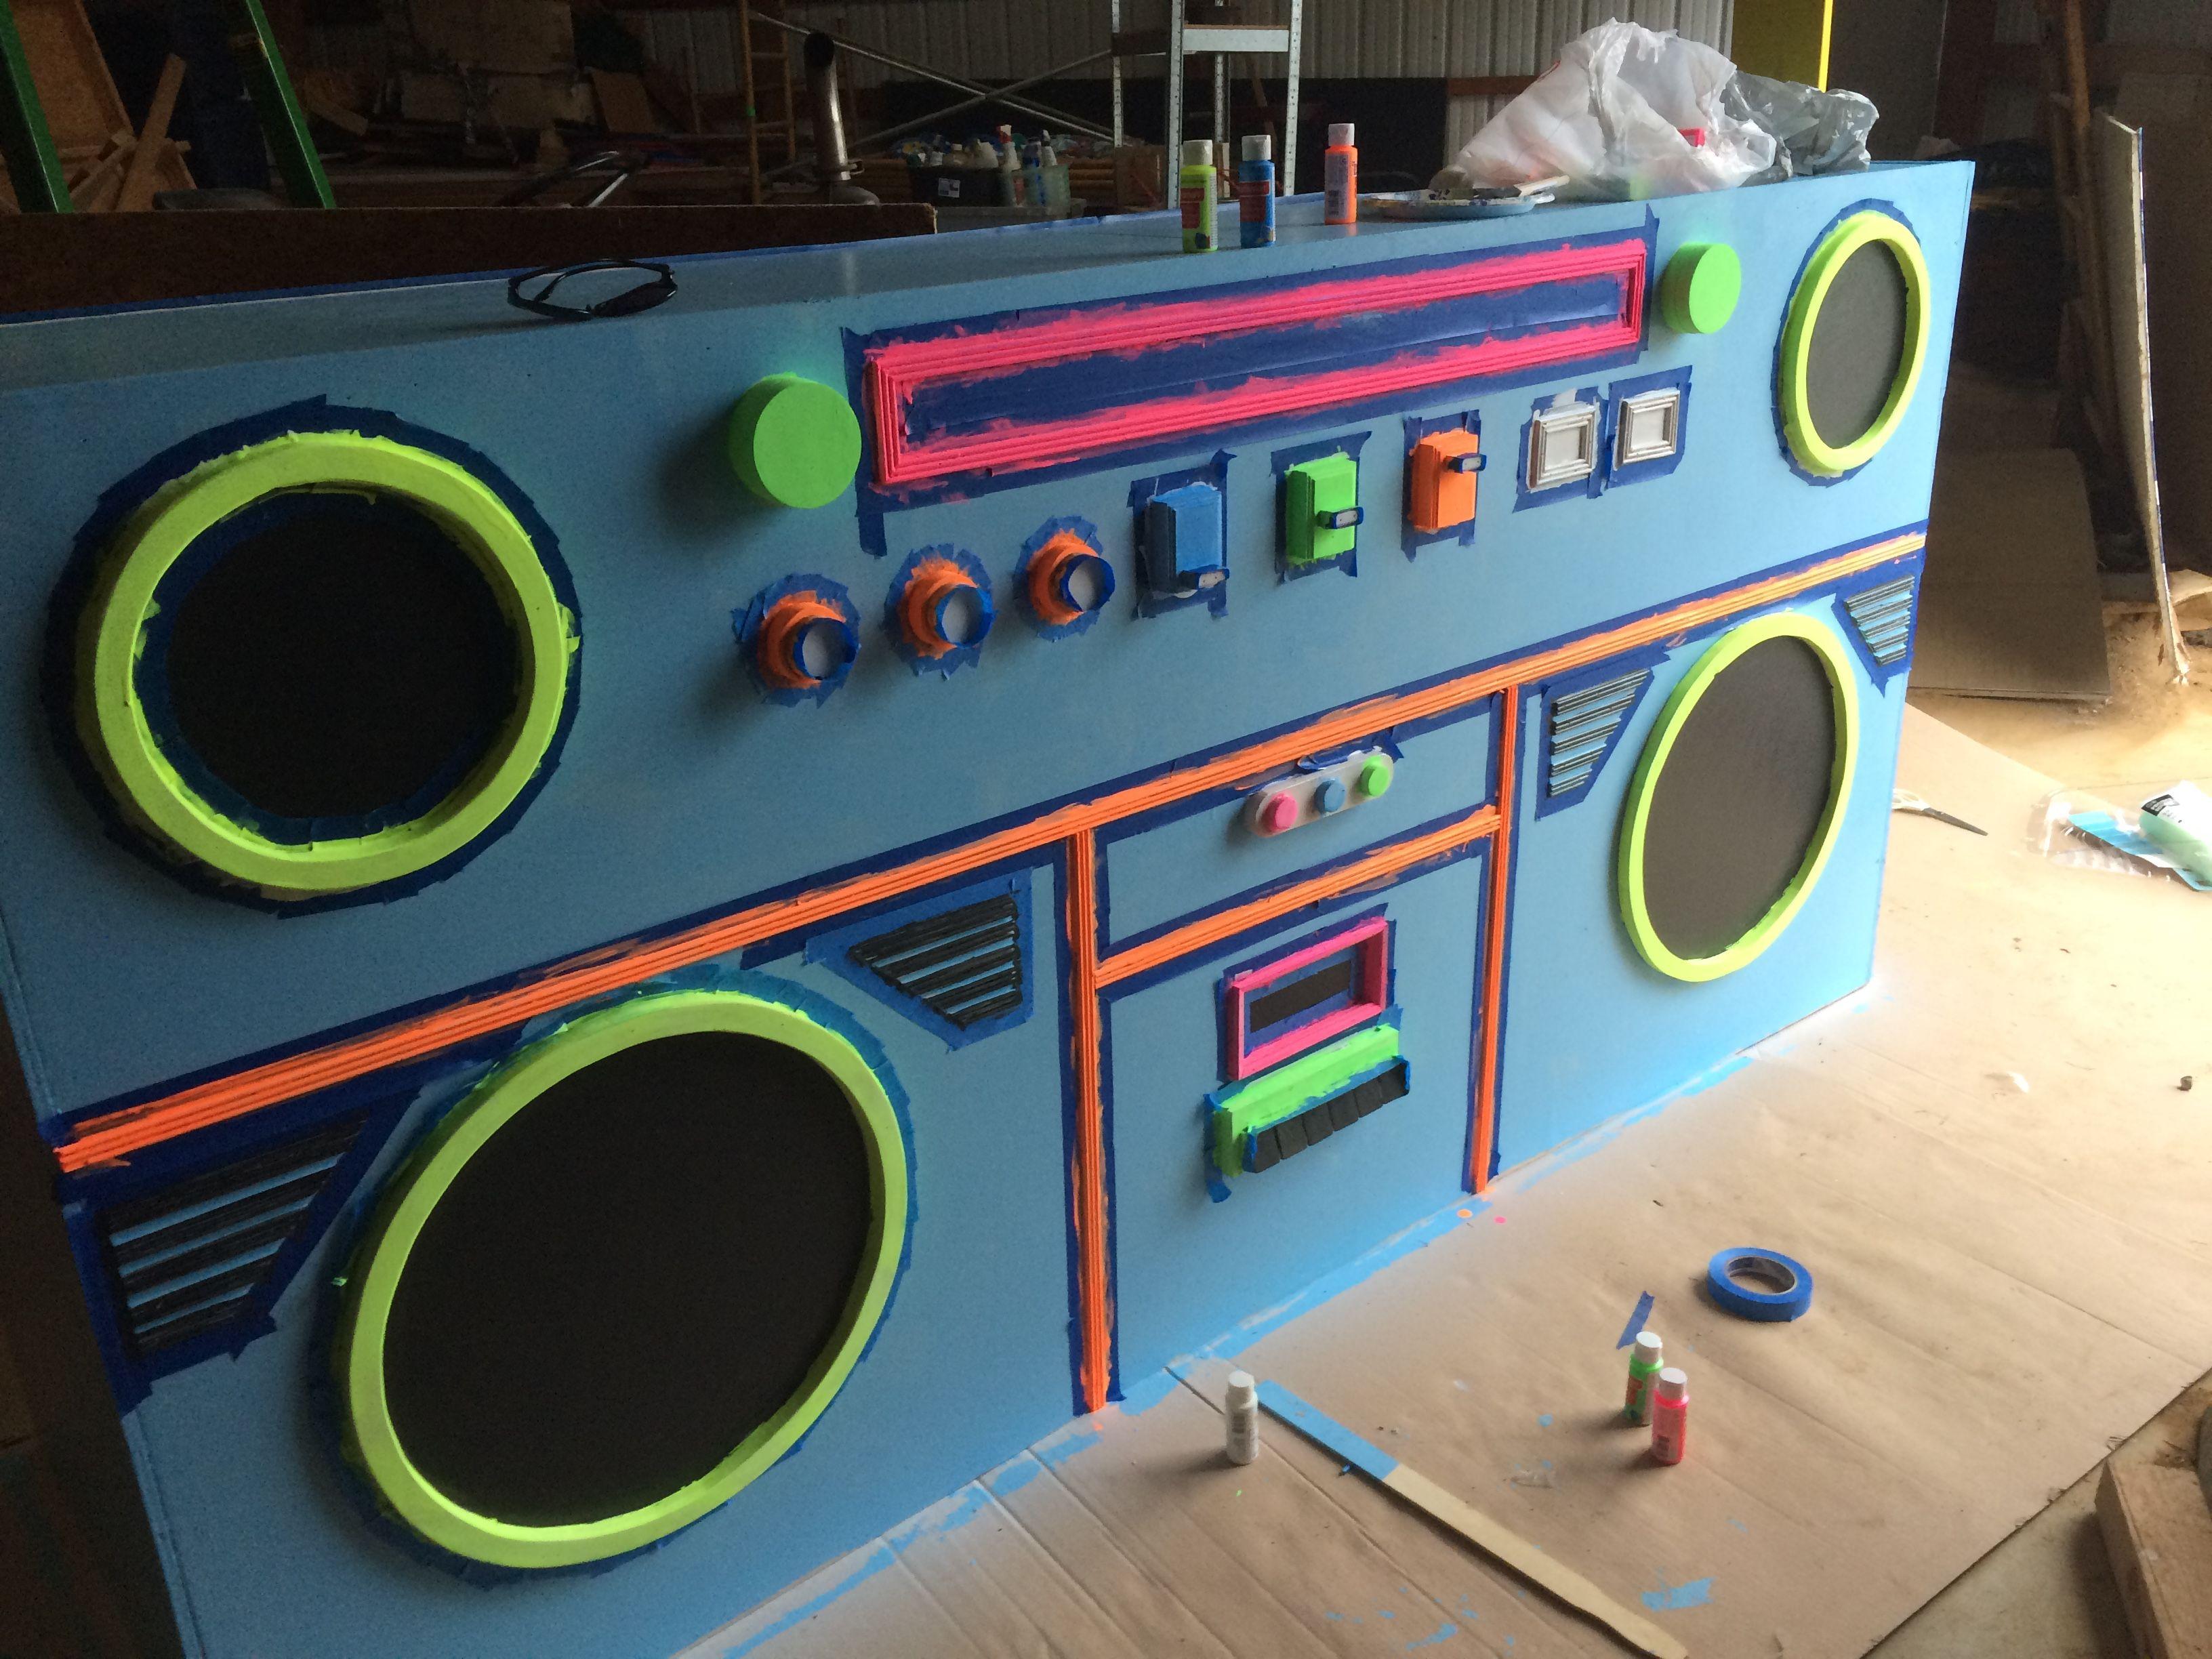 80s Ghetto Blaster DJ booth 80s theme party, Glow party